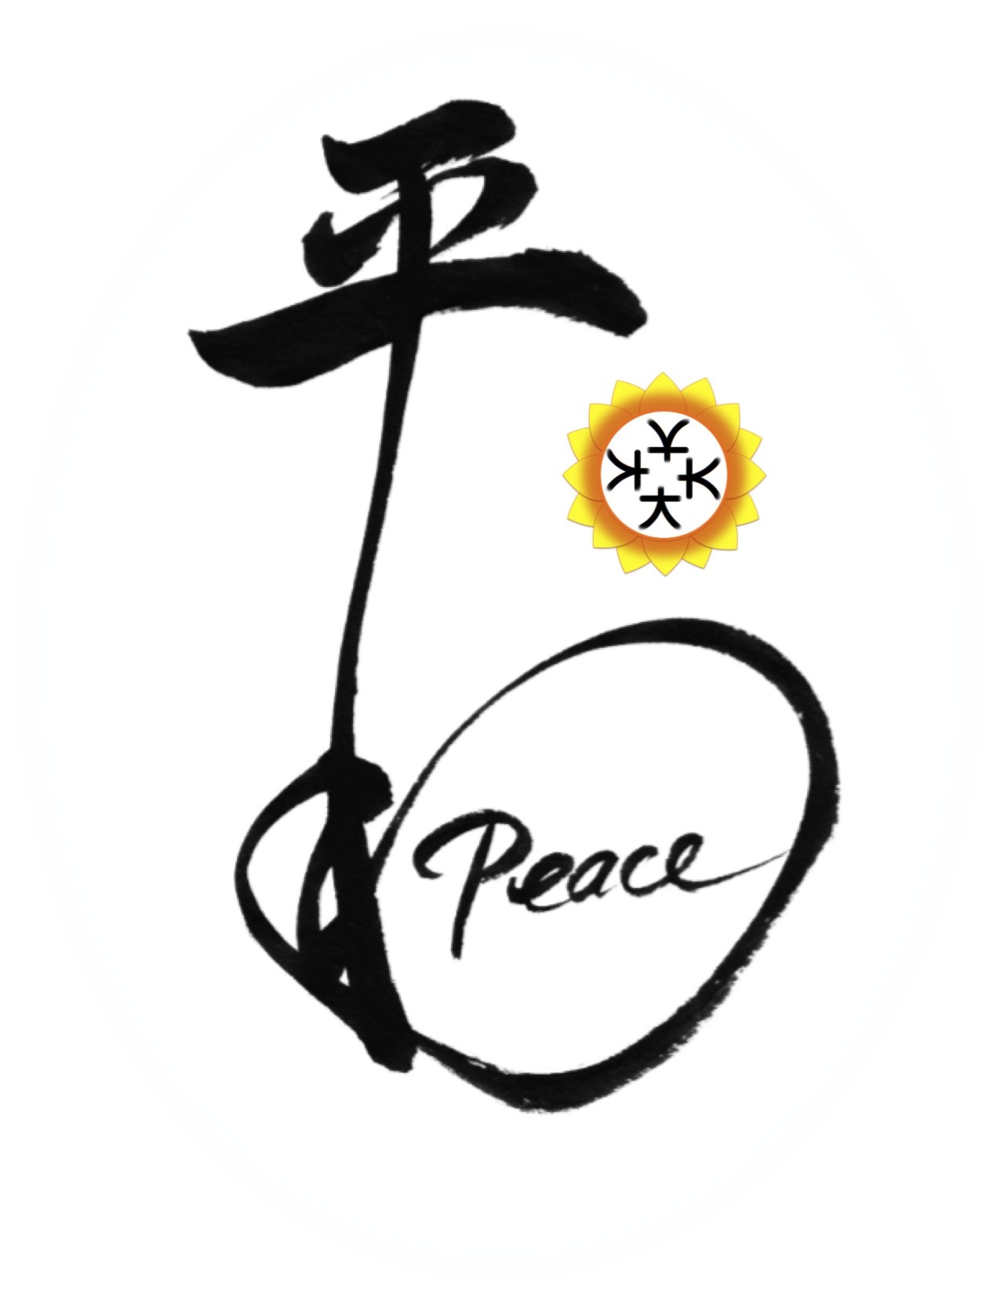 Heiwa Peace & Reconciliation Foundation of New York Ltd